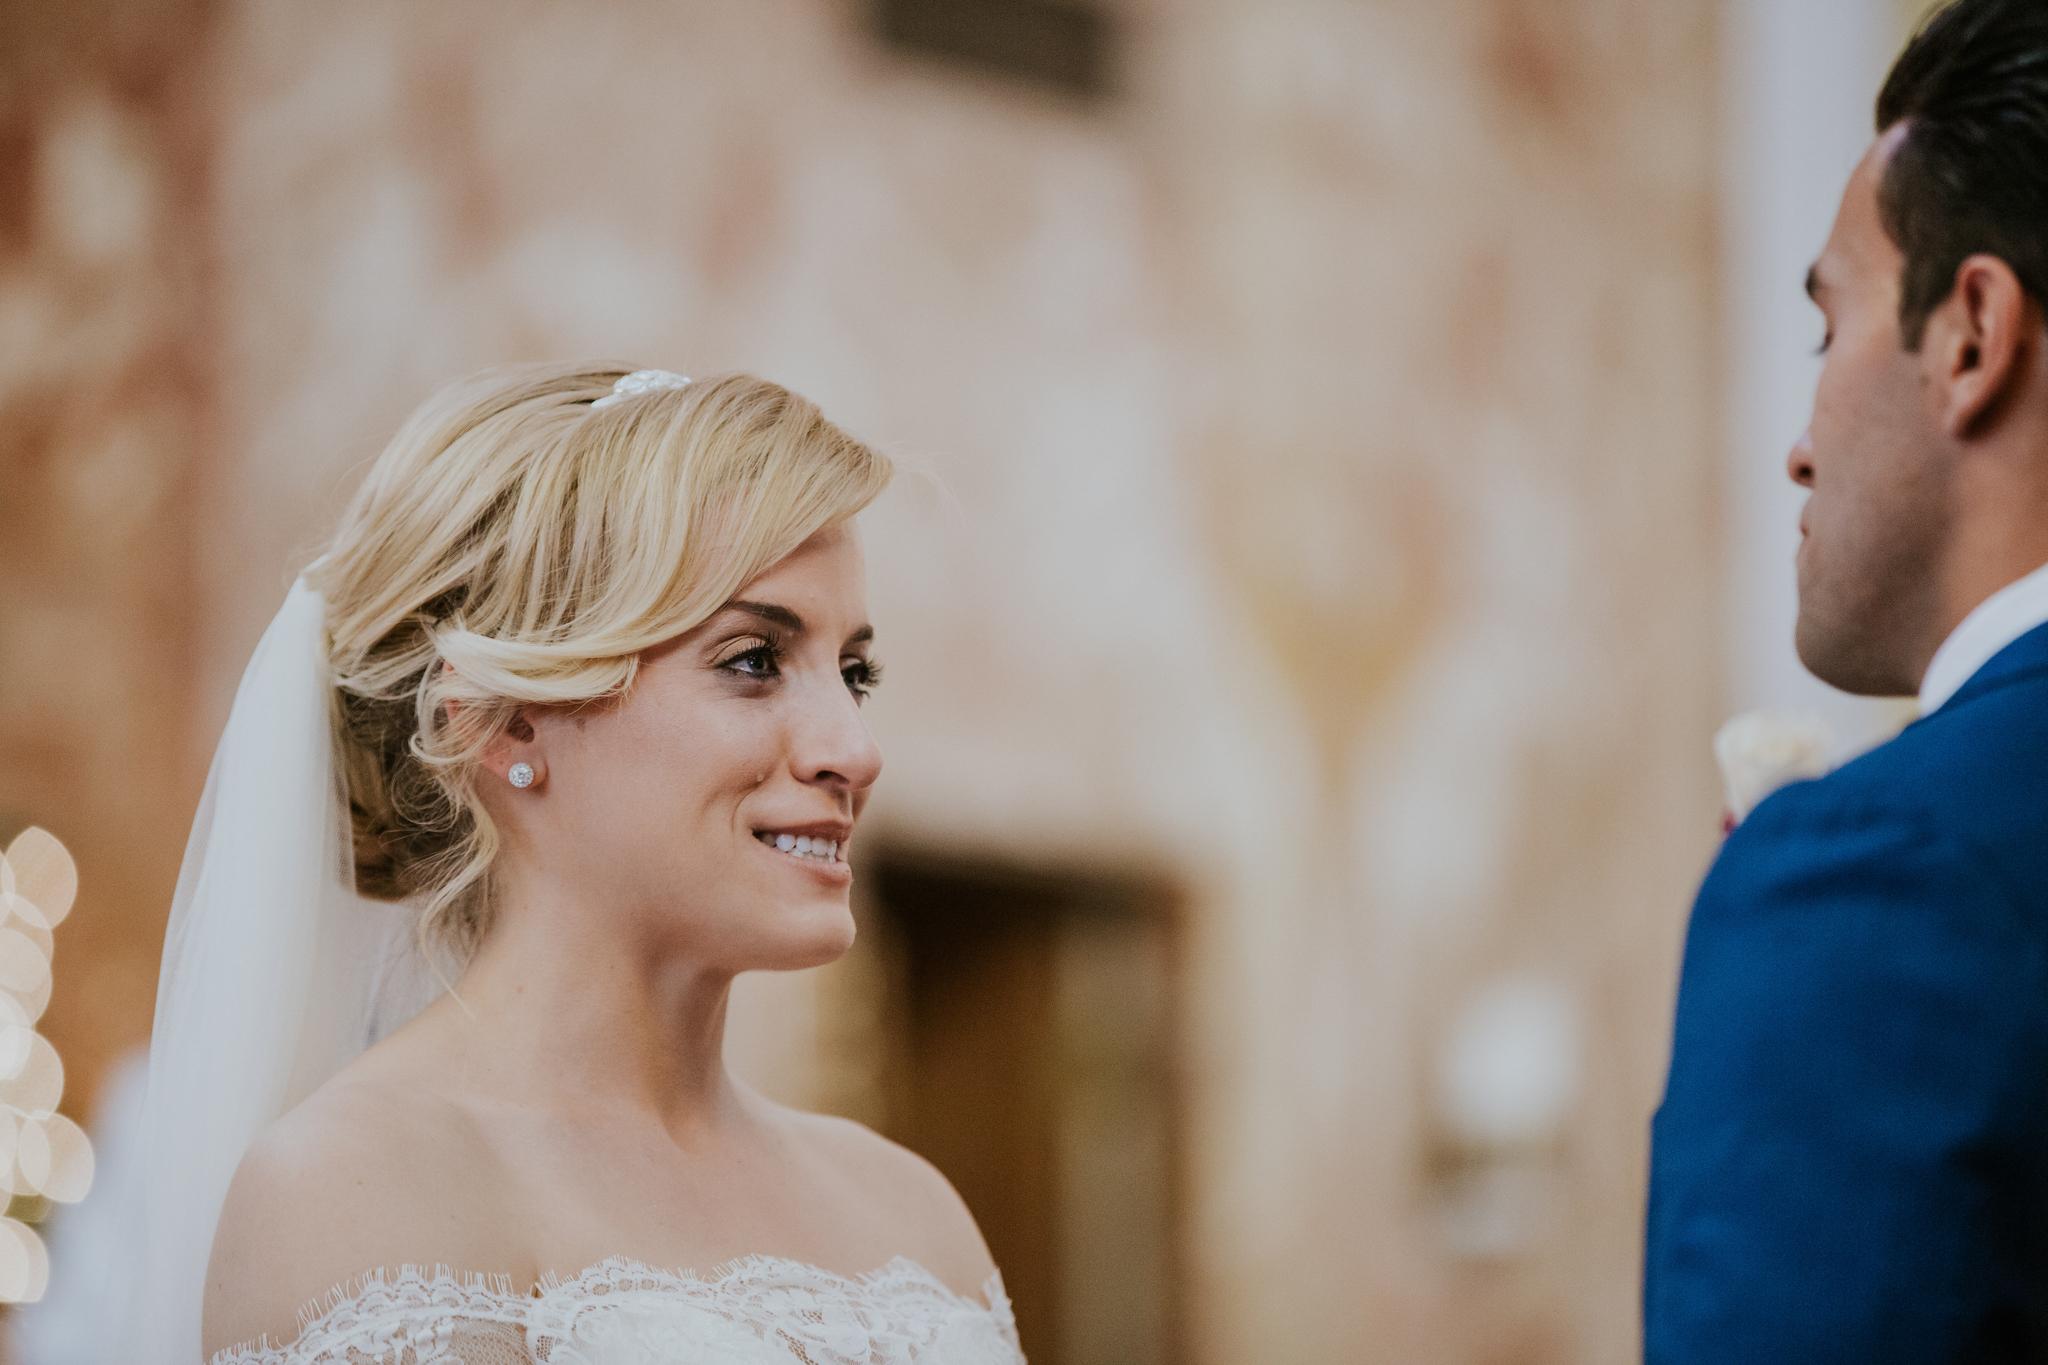 20151230_hussem_wedding_0461_web.jpg